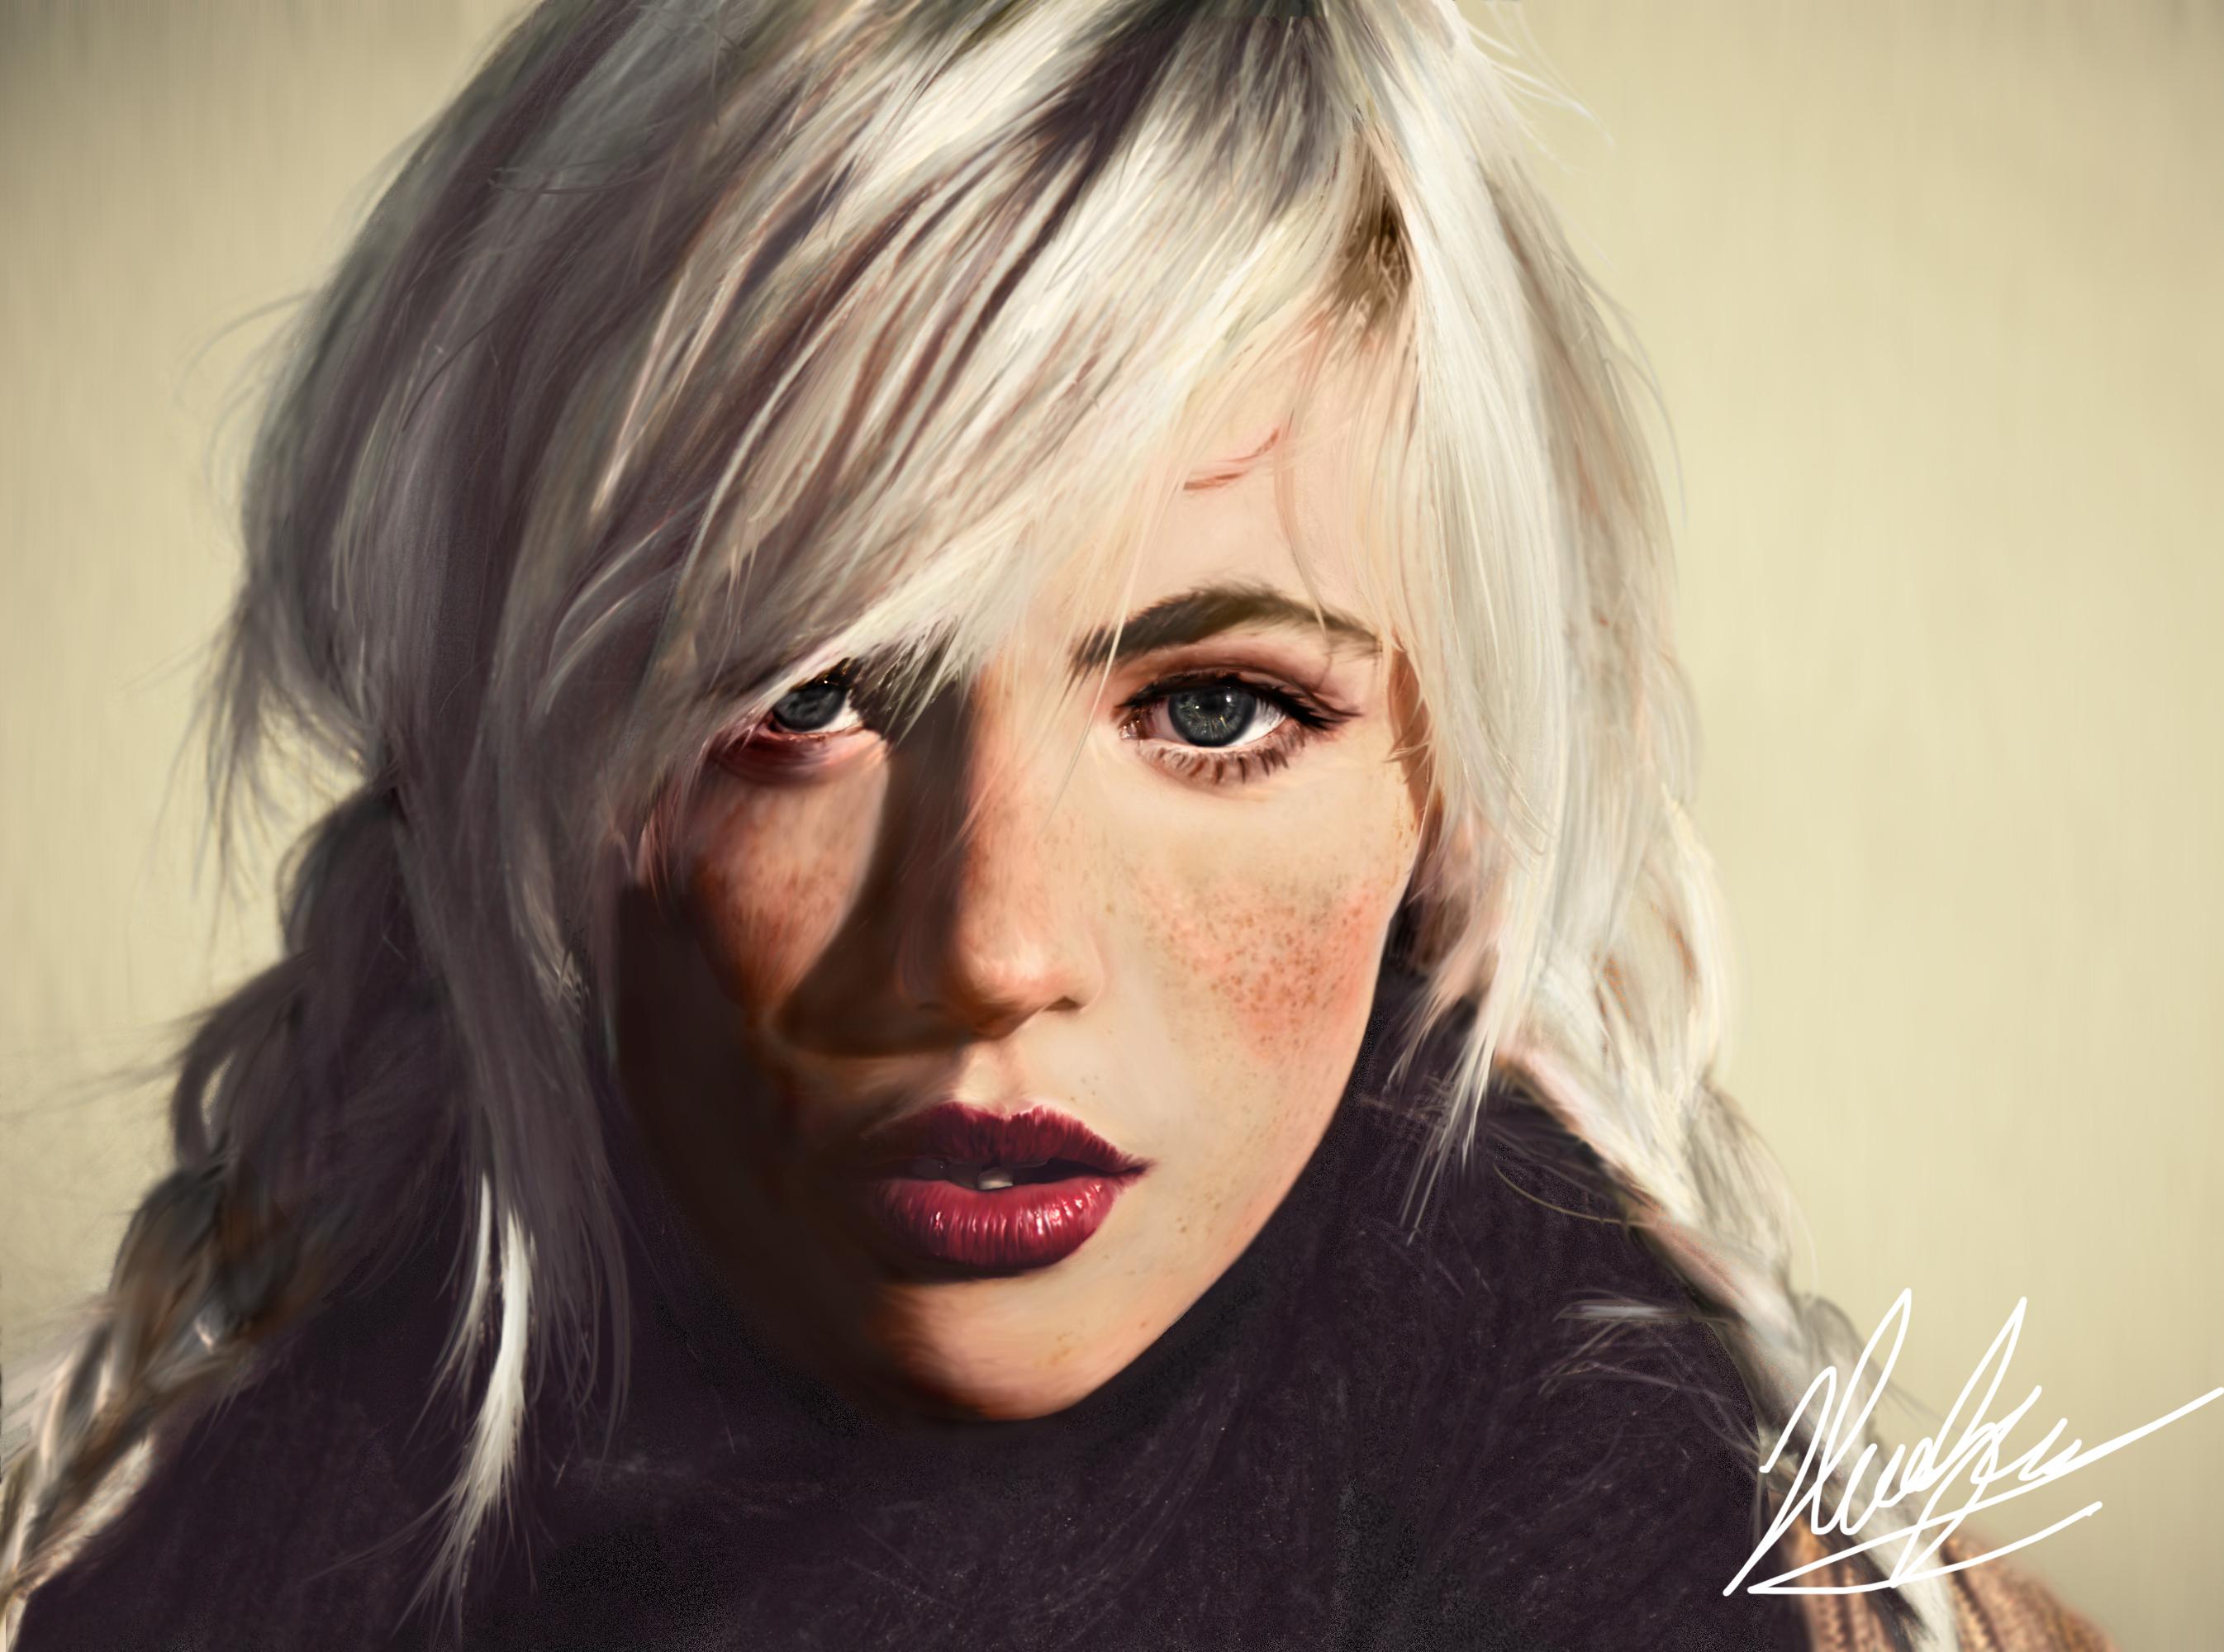 Digital Portrait 02 - Devon Jade by neoyurin on DeviantArt